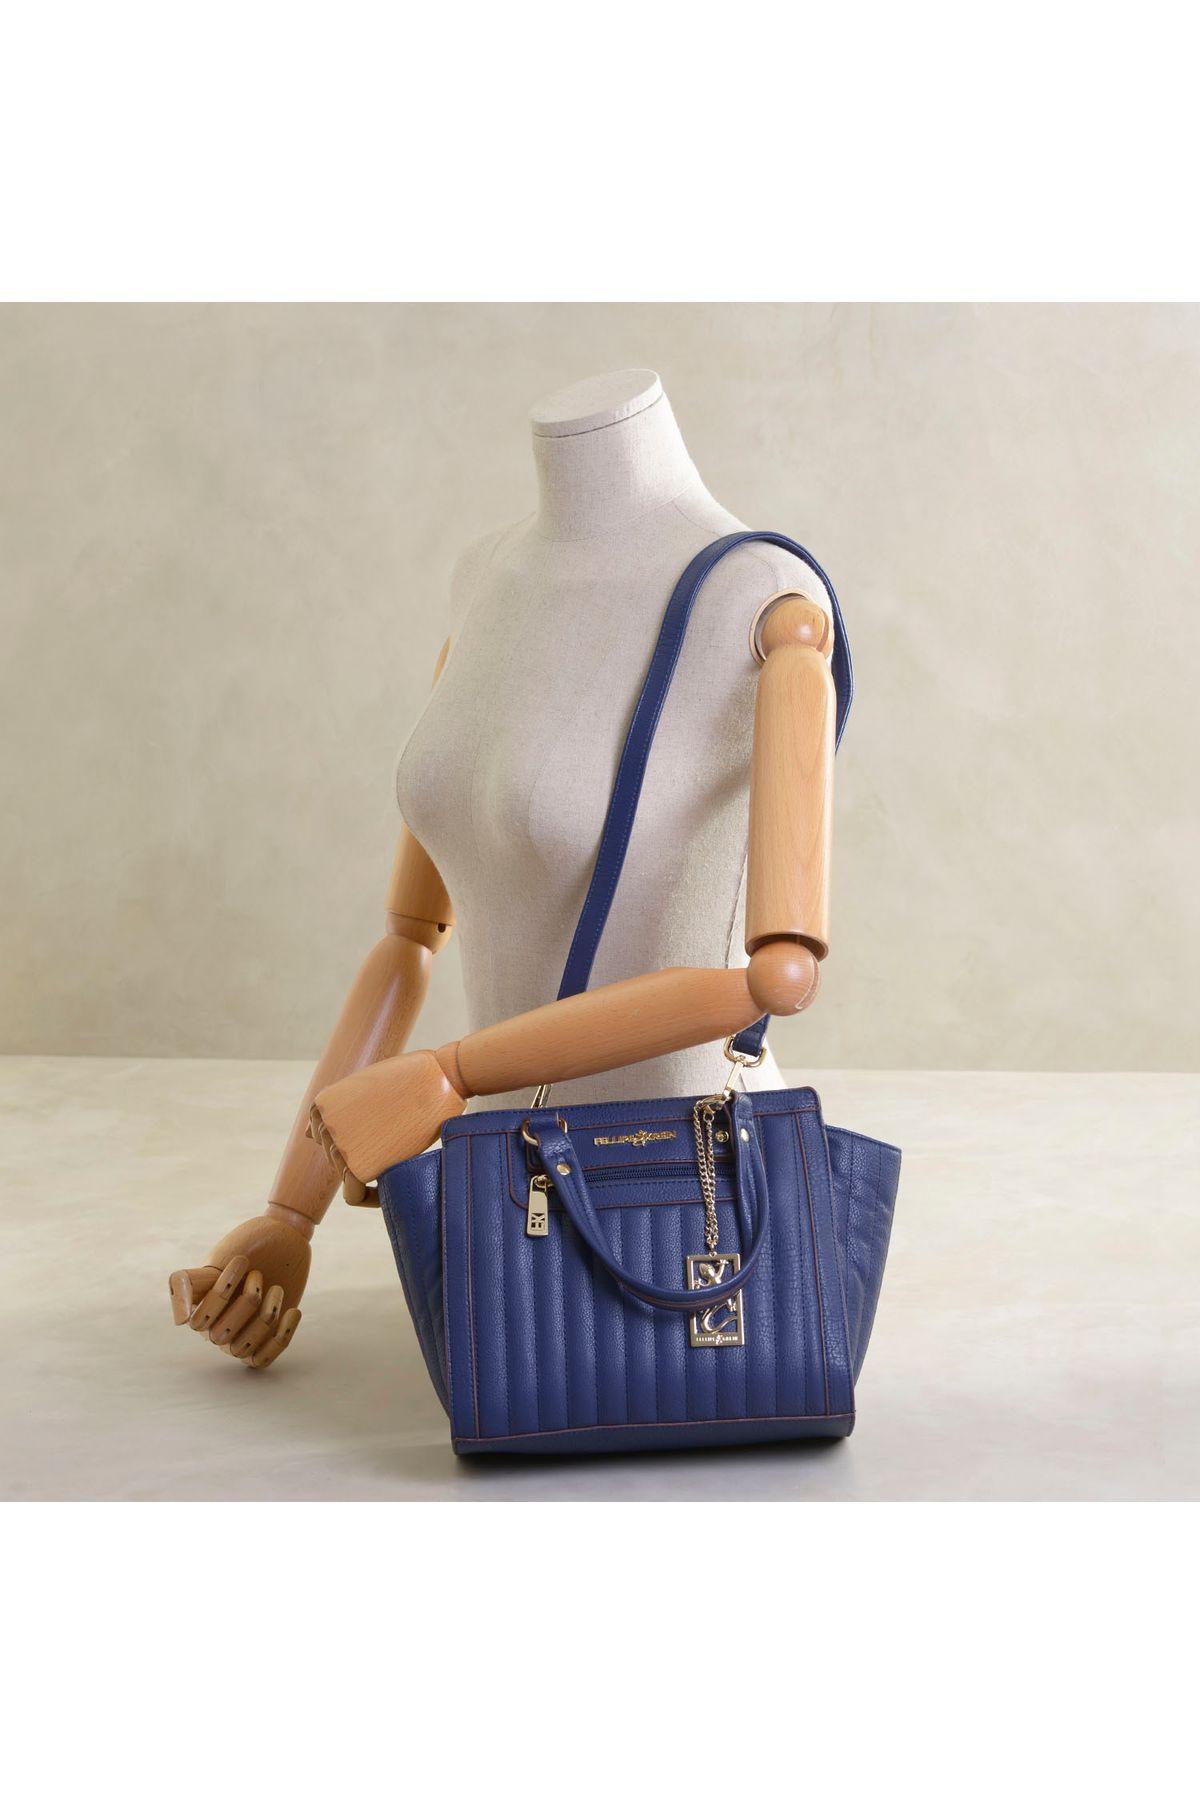 7e423b268 Bolsa Feminina Fellipe Krein Kenzie   Mundial Calçados - Mundial ...